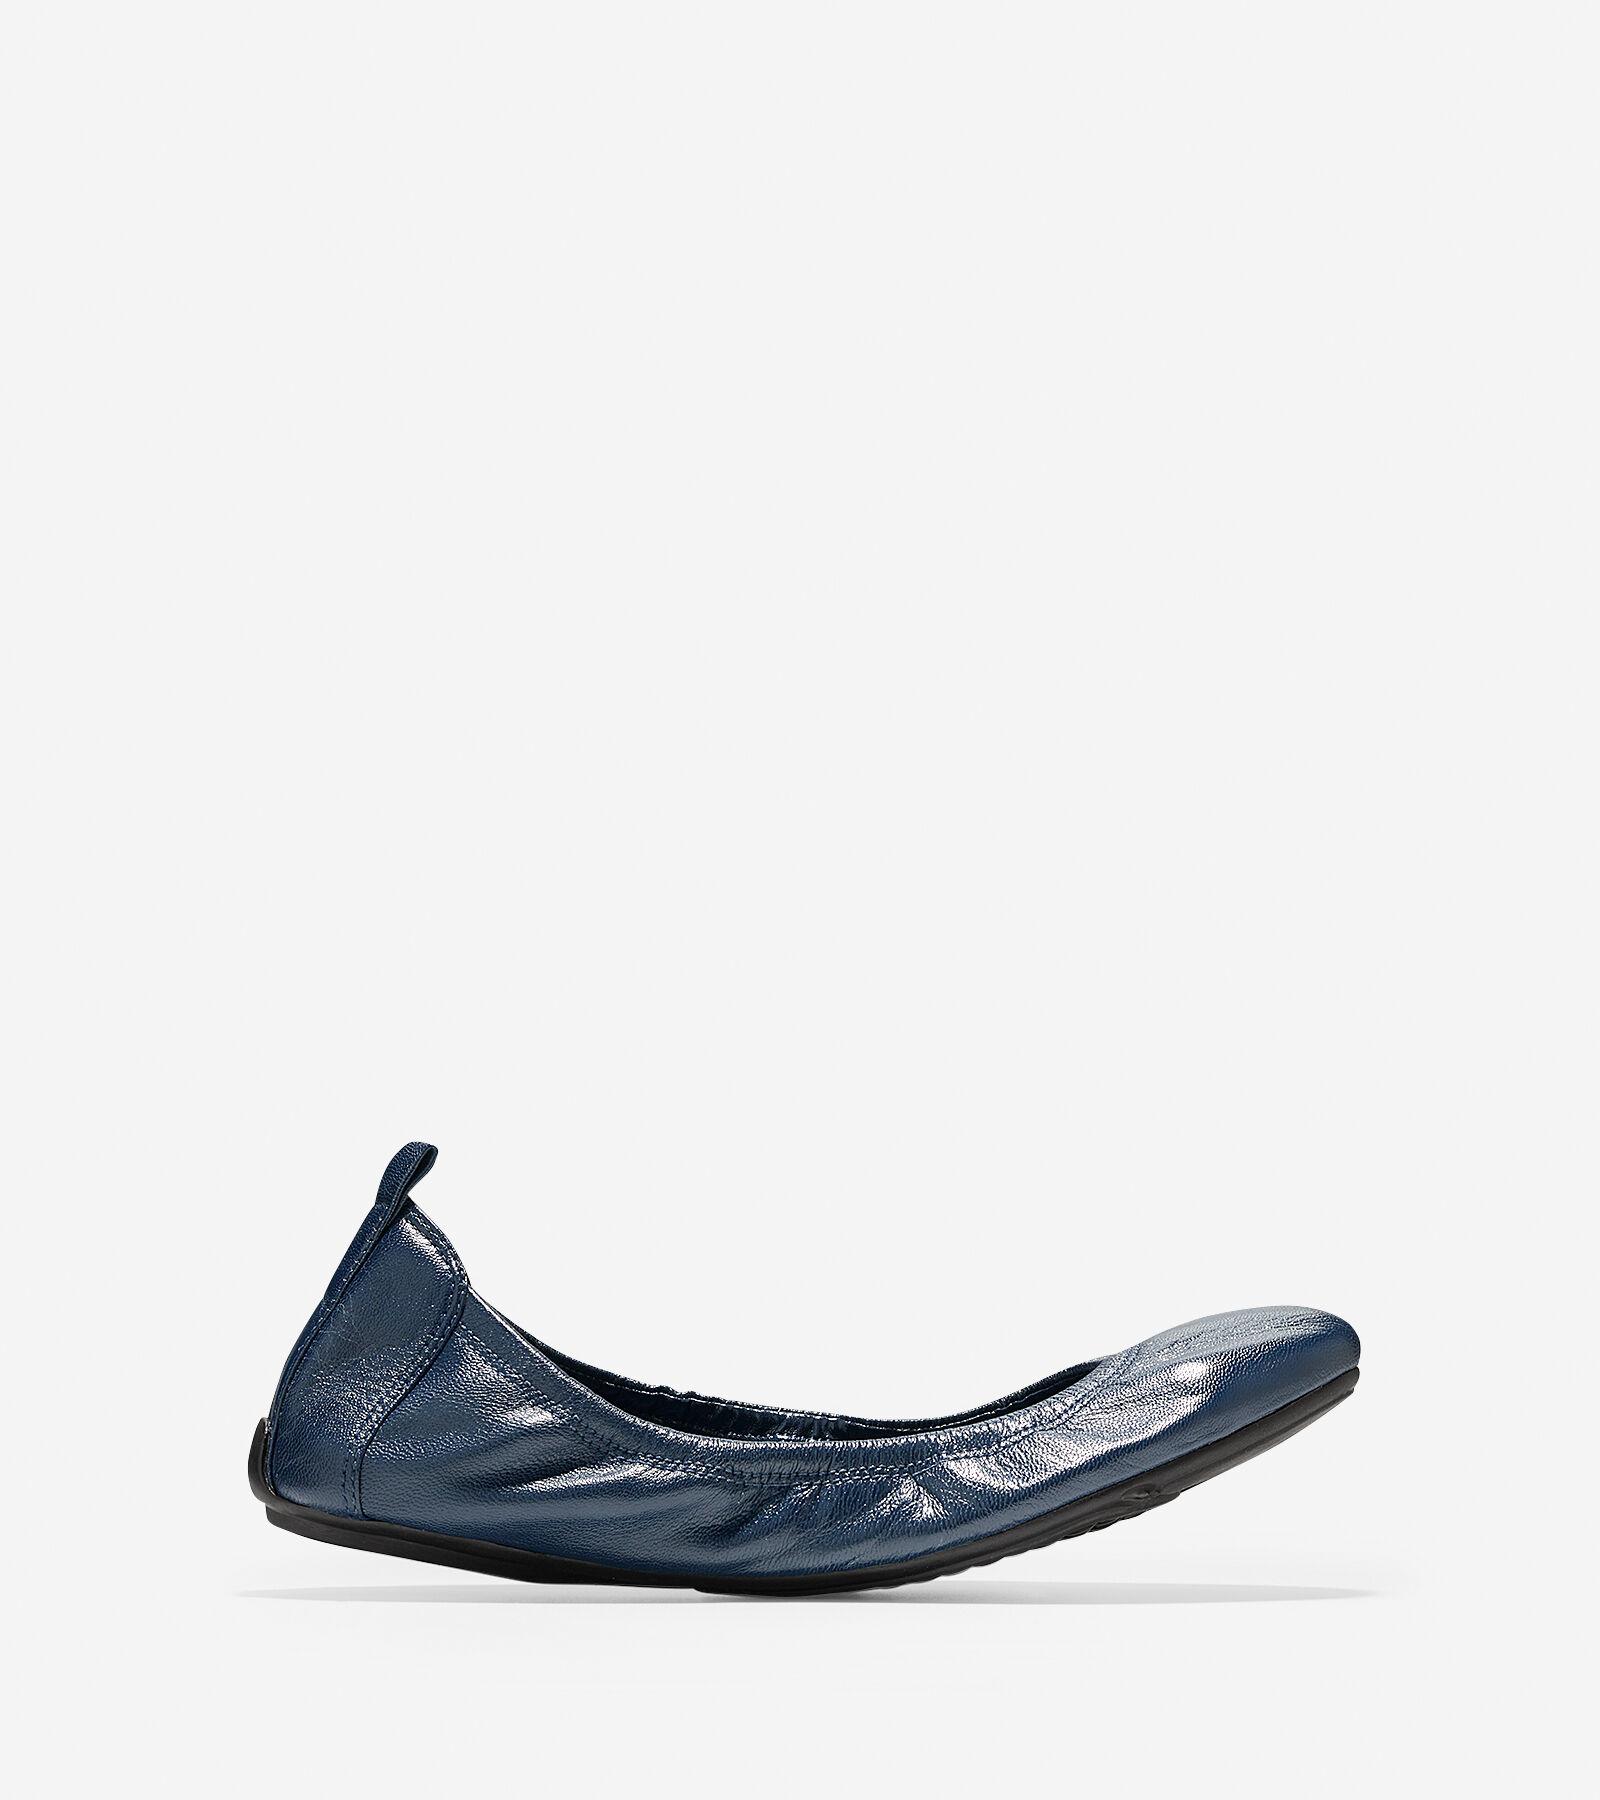 Womens Shoes Cole Haan Jenni Ballet II Blazer Blue